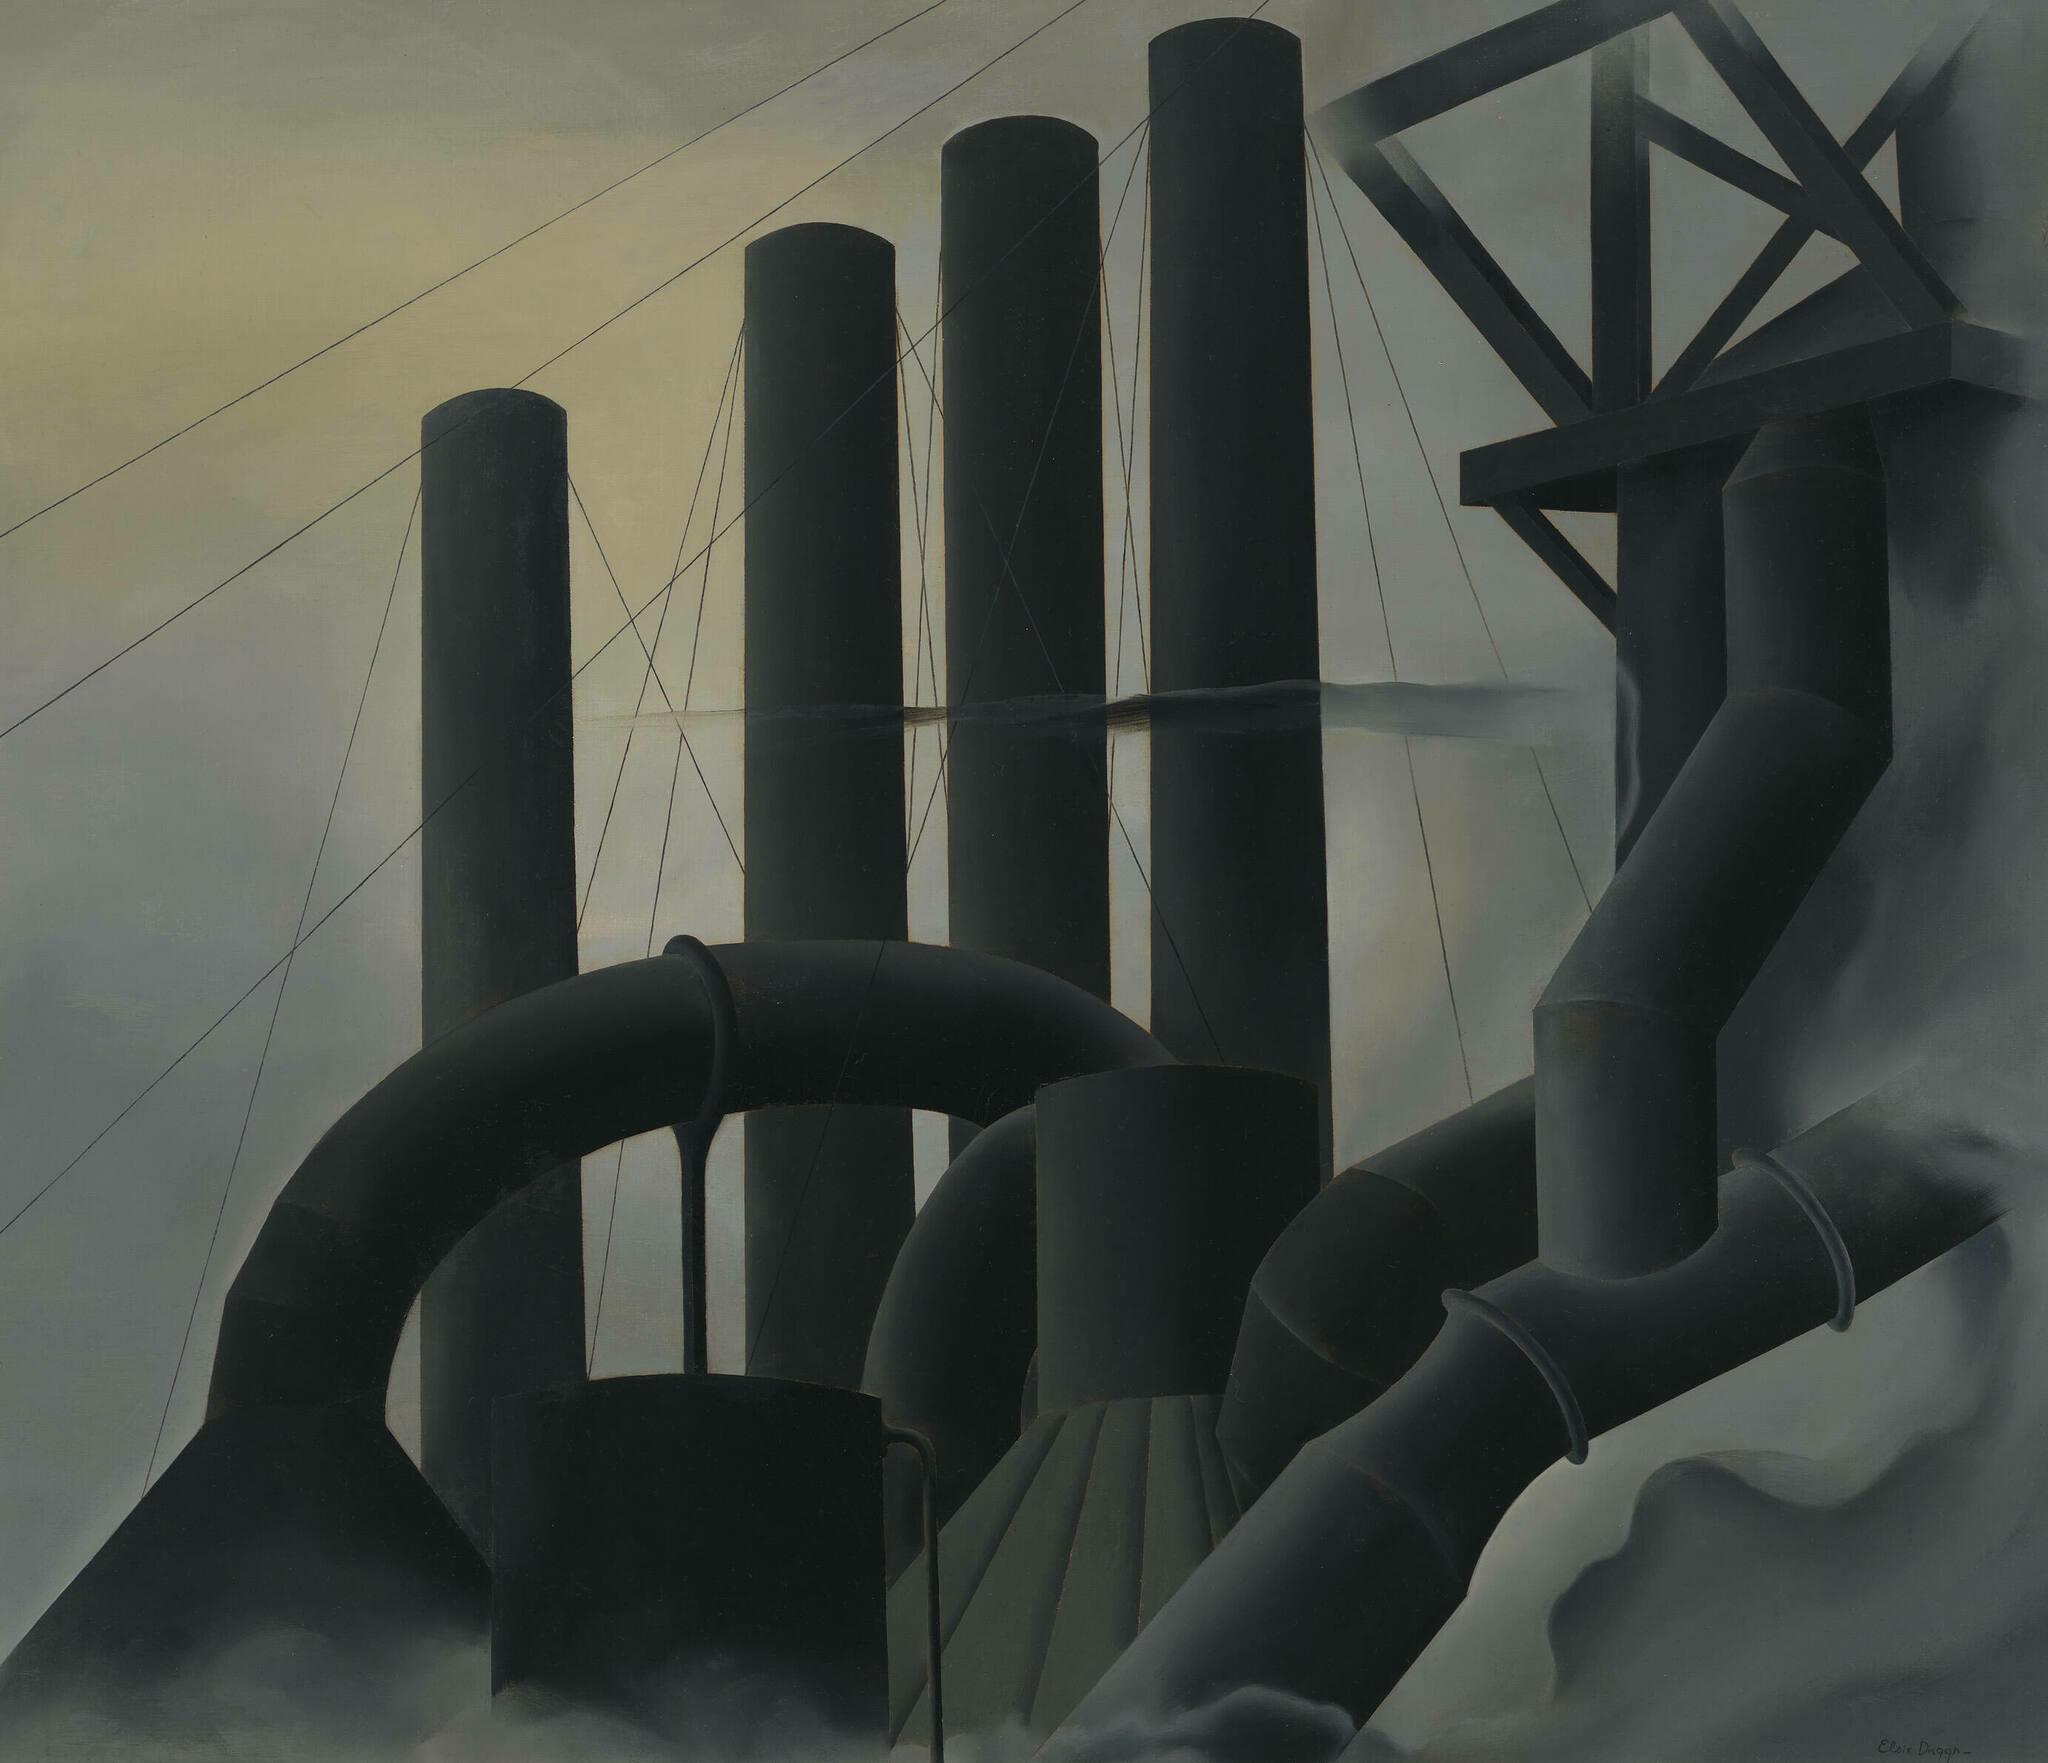 Dark smoke stacks towering against a gray sky